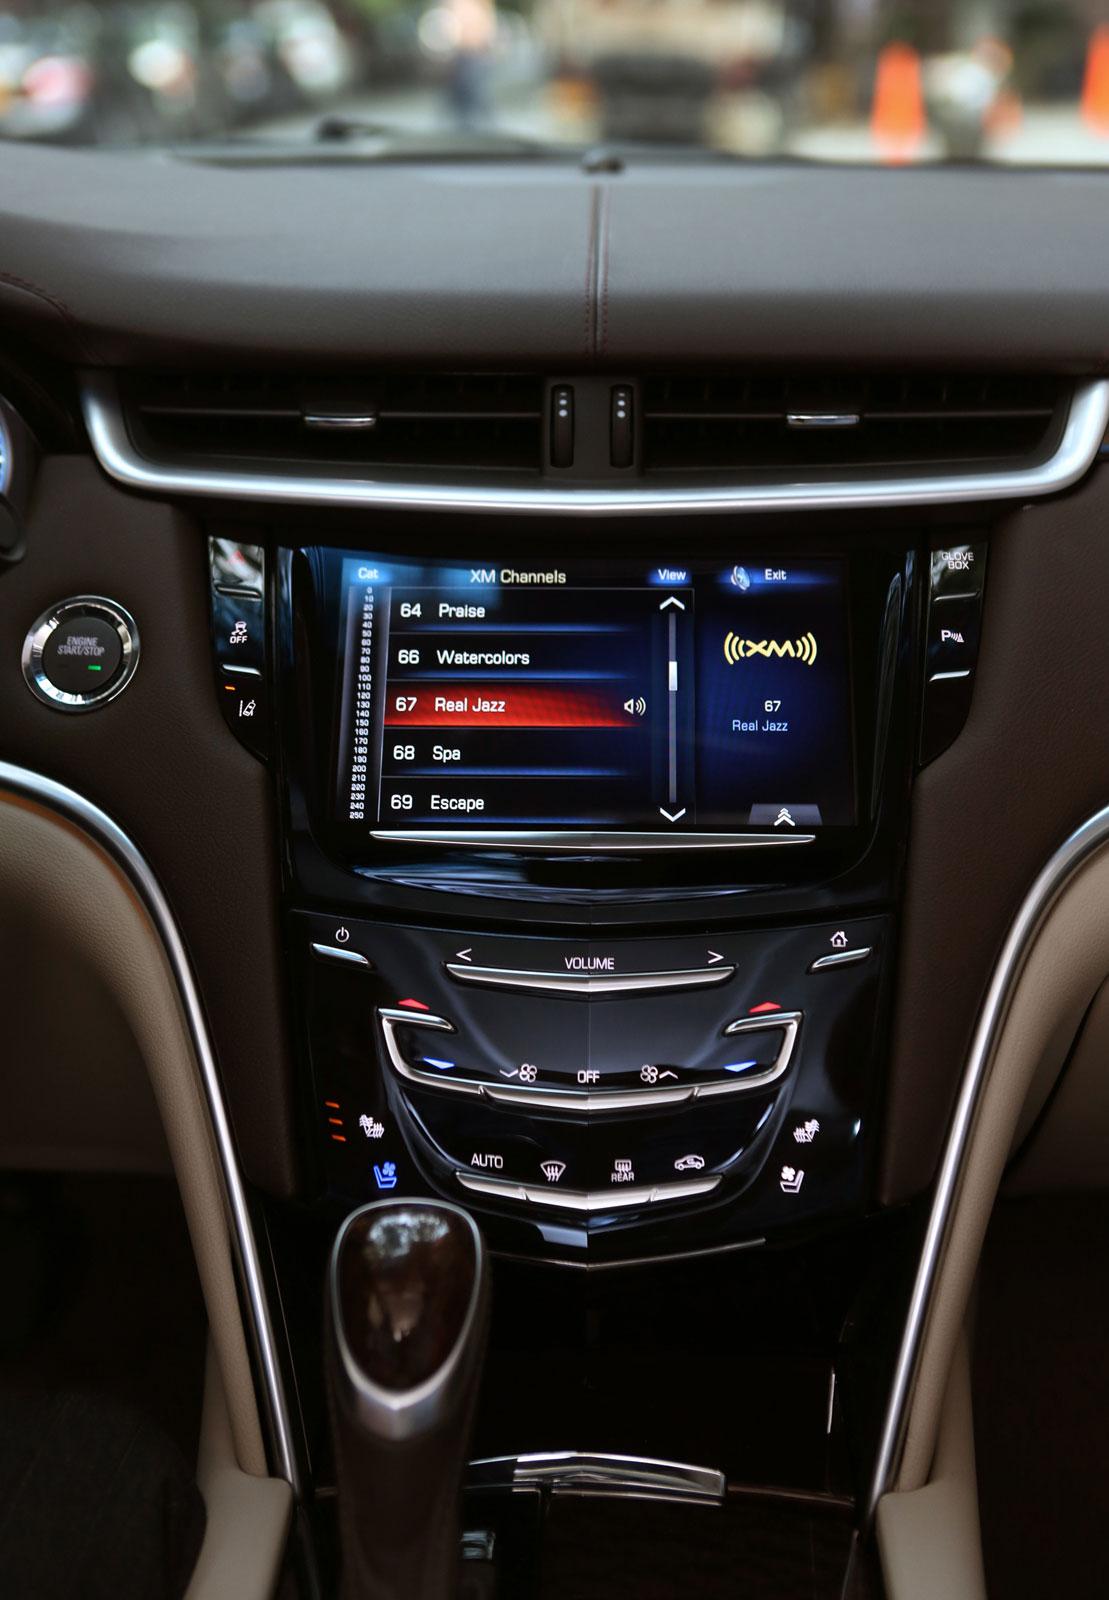 2013 Cadillac Xts Interior Car Body Design